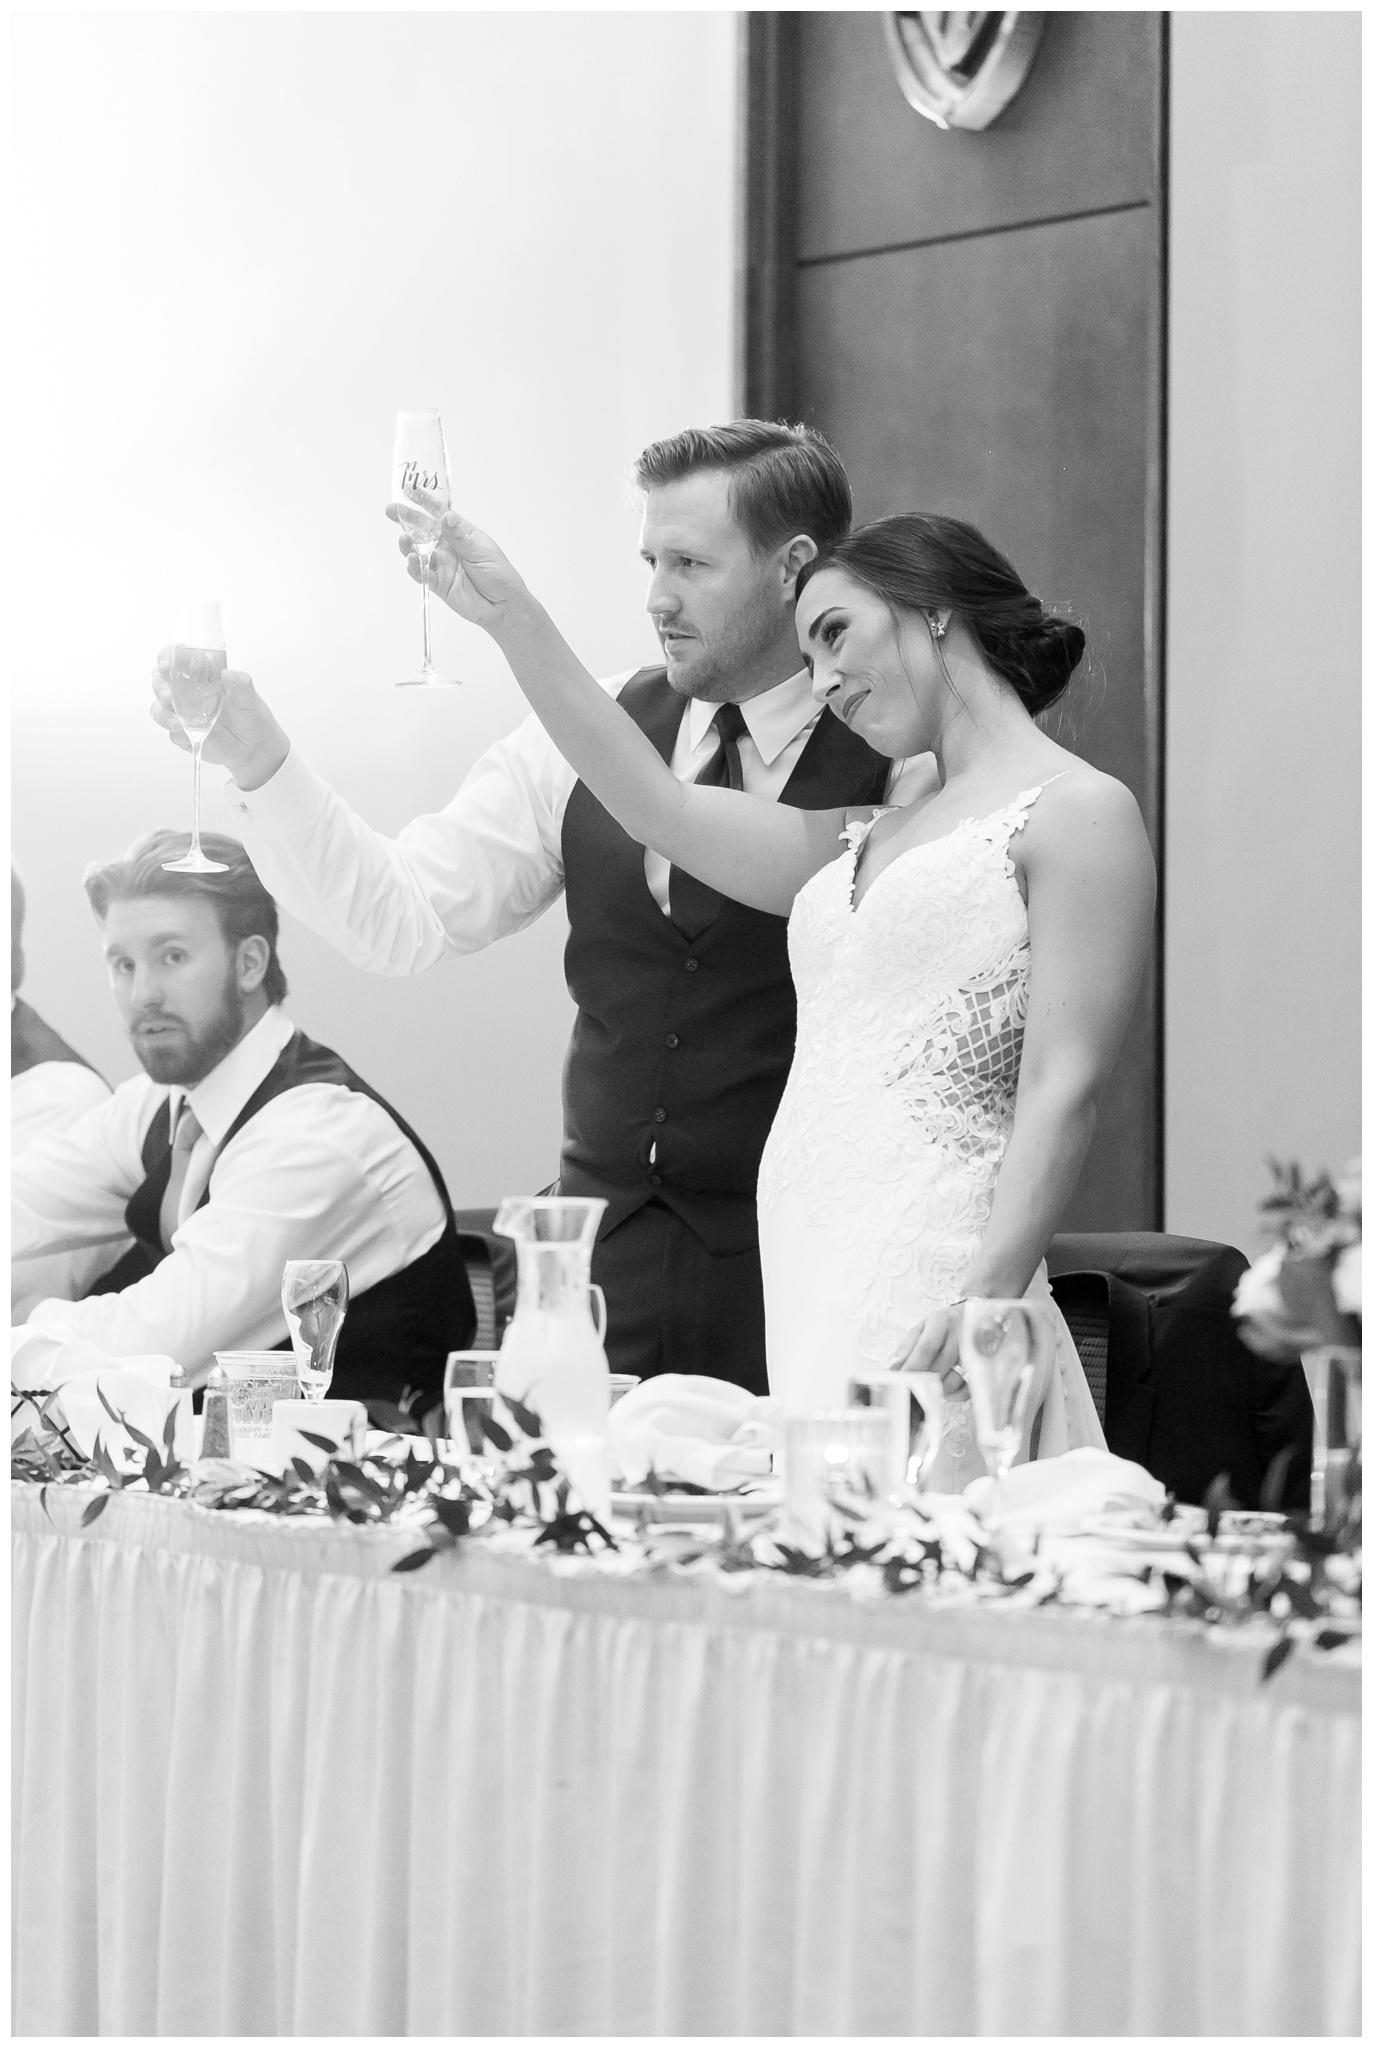 Union_south_Wedding_Madison_Wisconsin_Caynay_Photo_3692.jpg